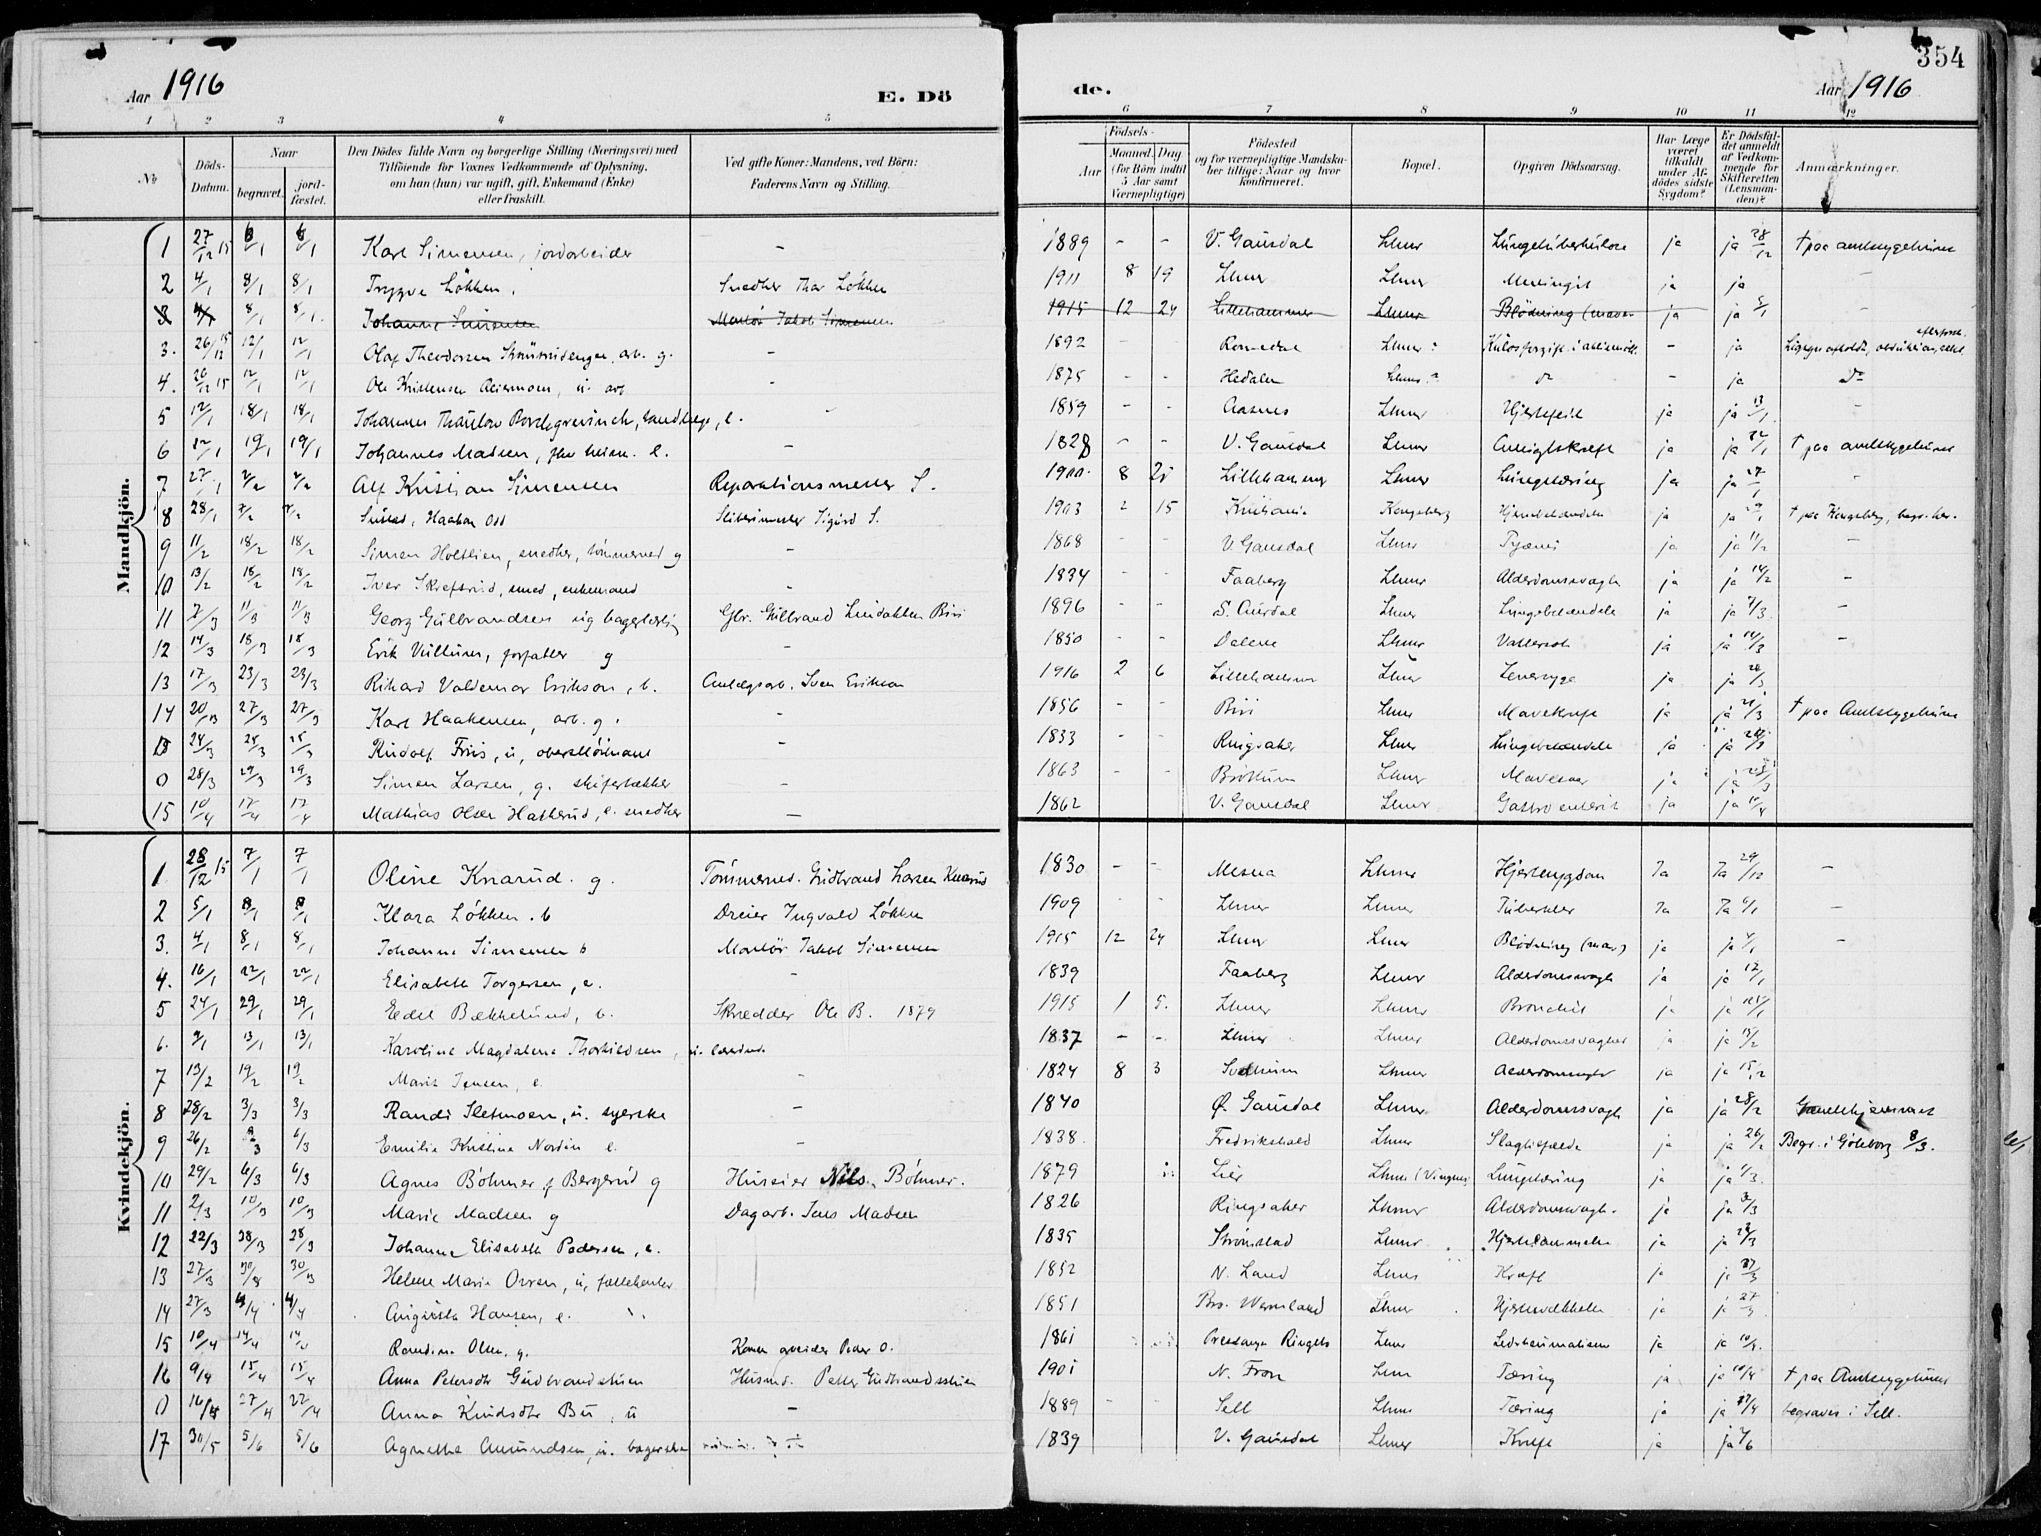 SAH, Lillehammer prestekontor, Ministerialbok nr. 1, 1901-1916, s. 354